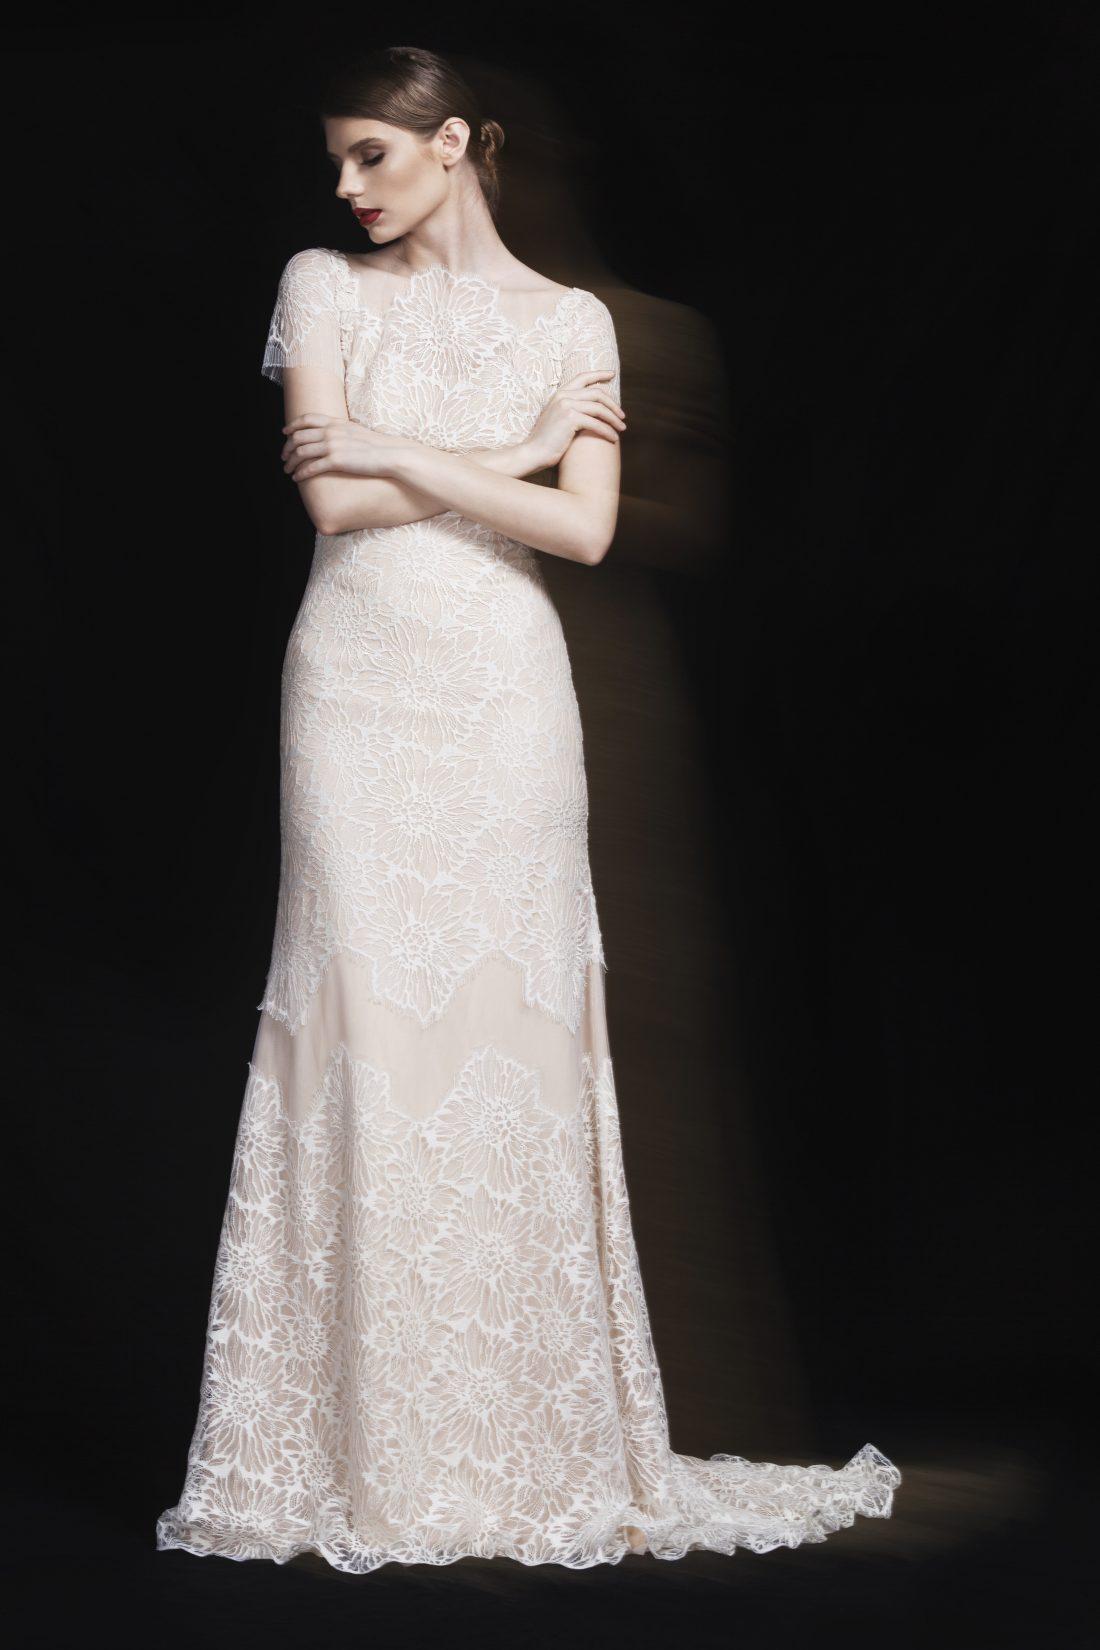 Beau Monde ~ Mirese | Tania Cozma makeup